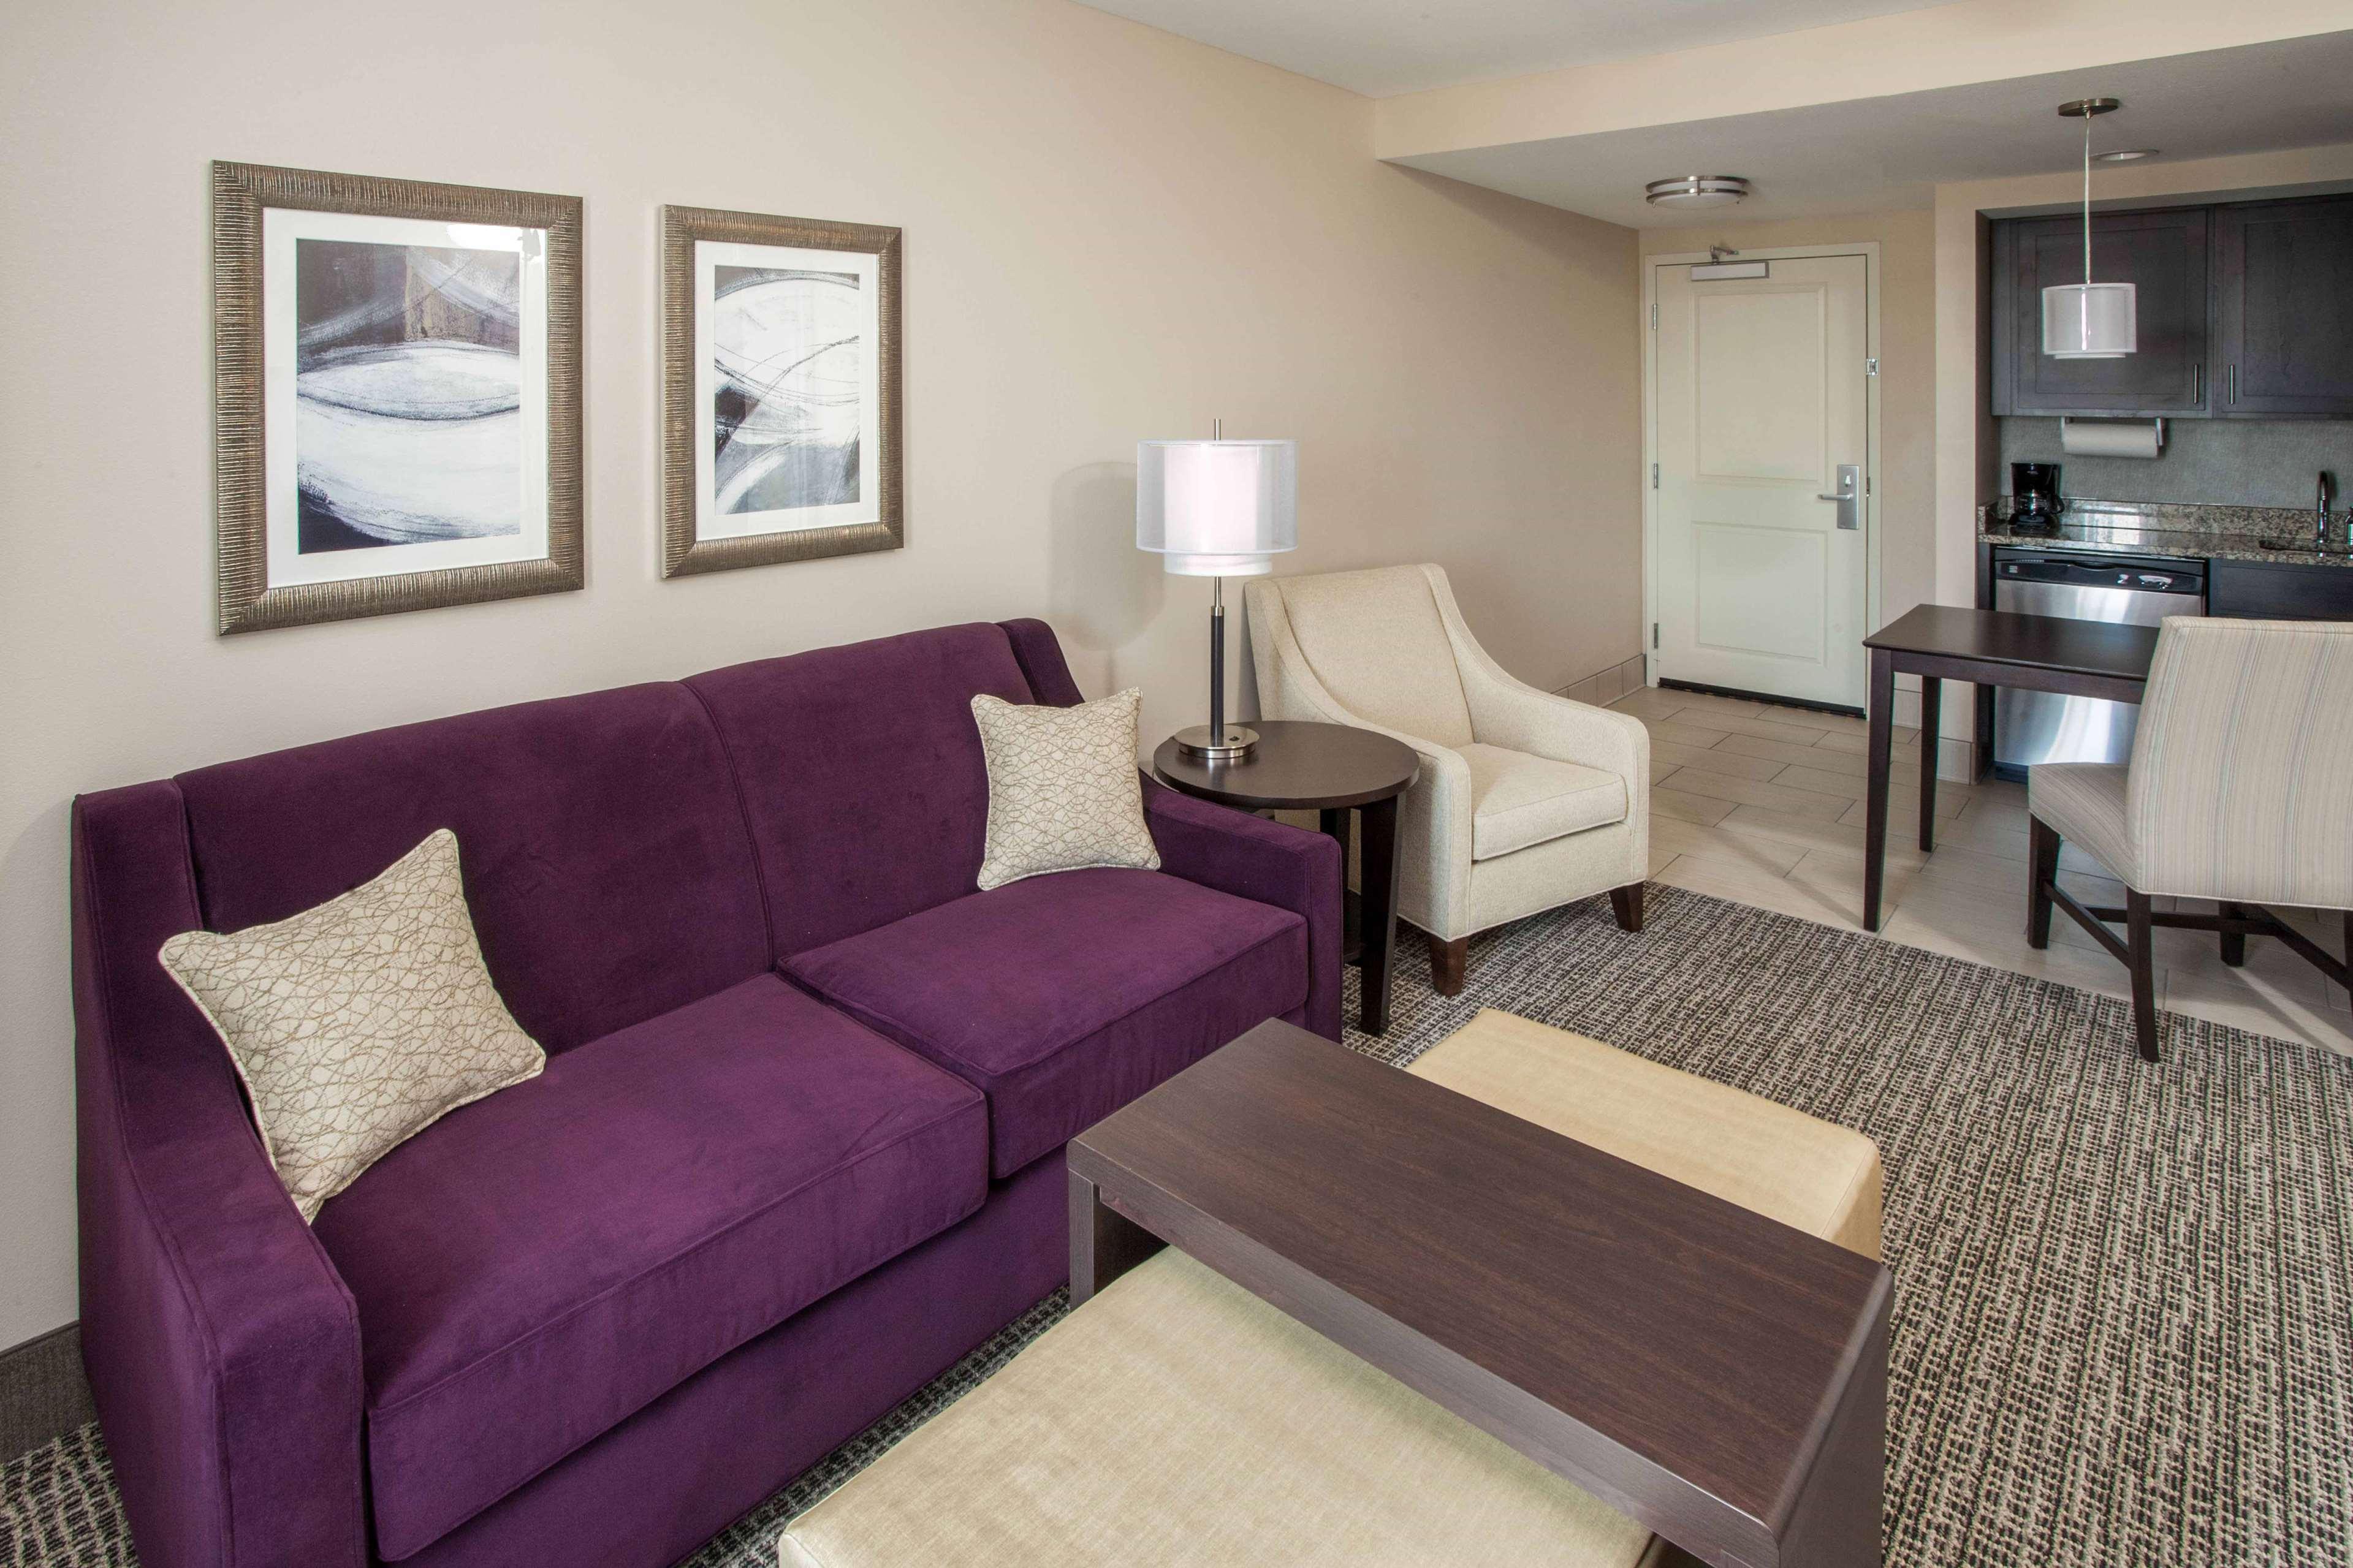 Homewood Suites by Hilton Munster image 3